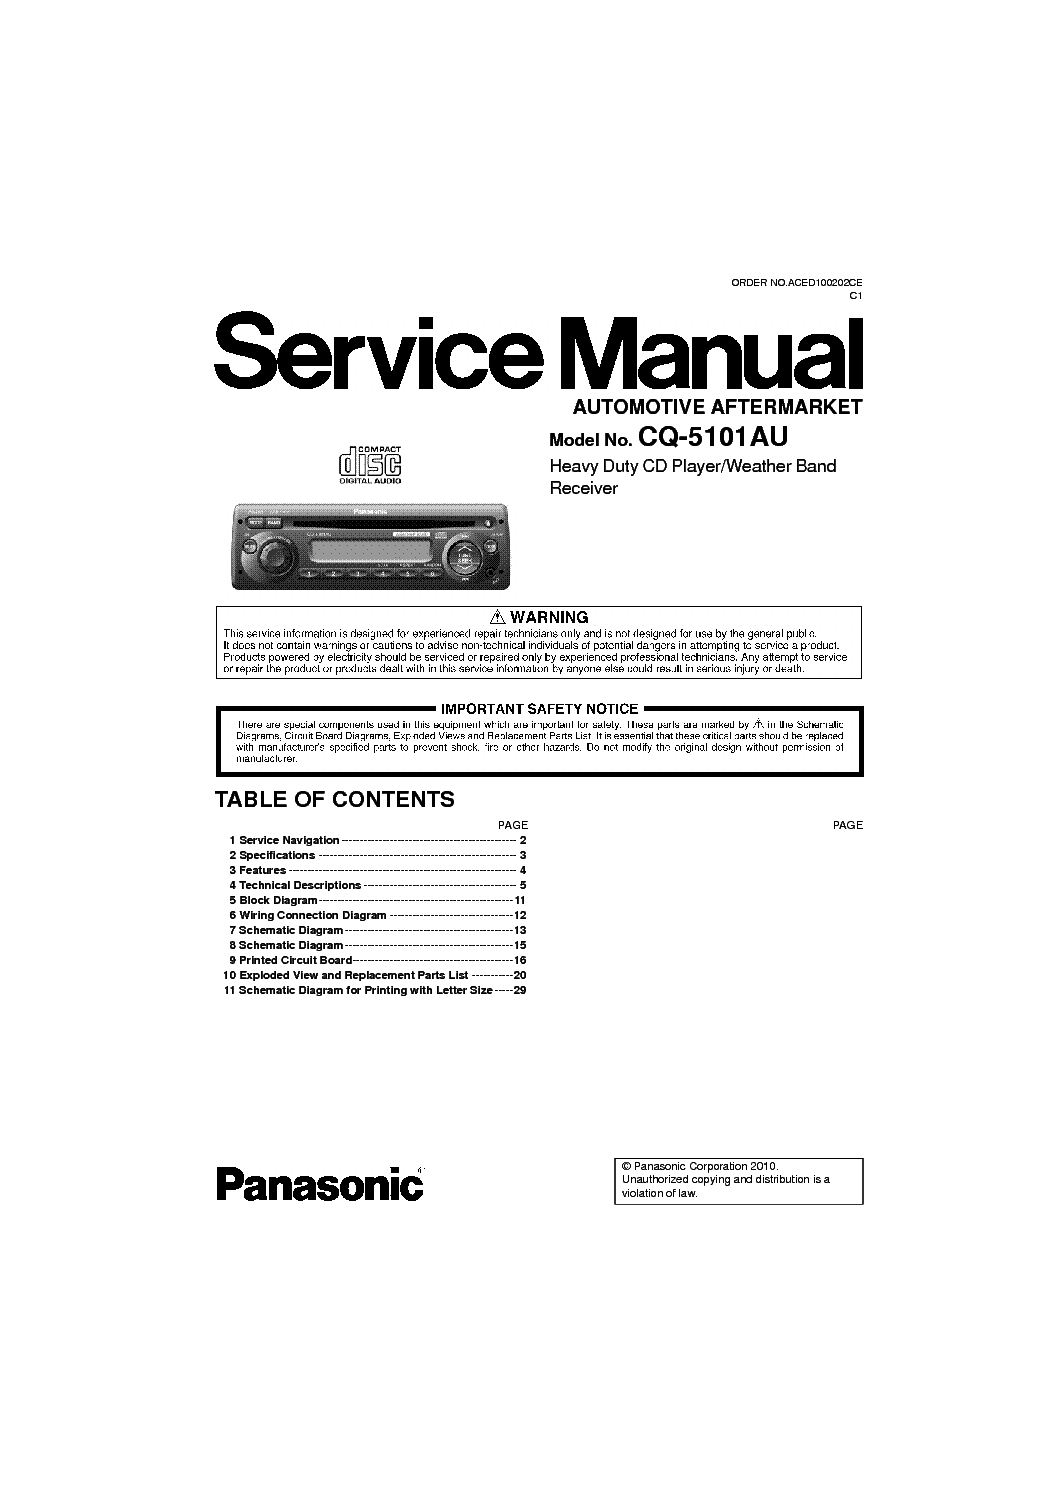 Radio Wiring Diagram For Panasonic Cq 5300u Schematic Diagrams C5405u Circuit Residential Electrical Symbols U2022